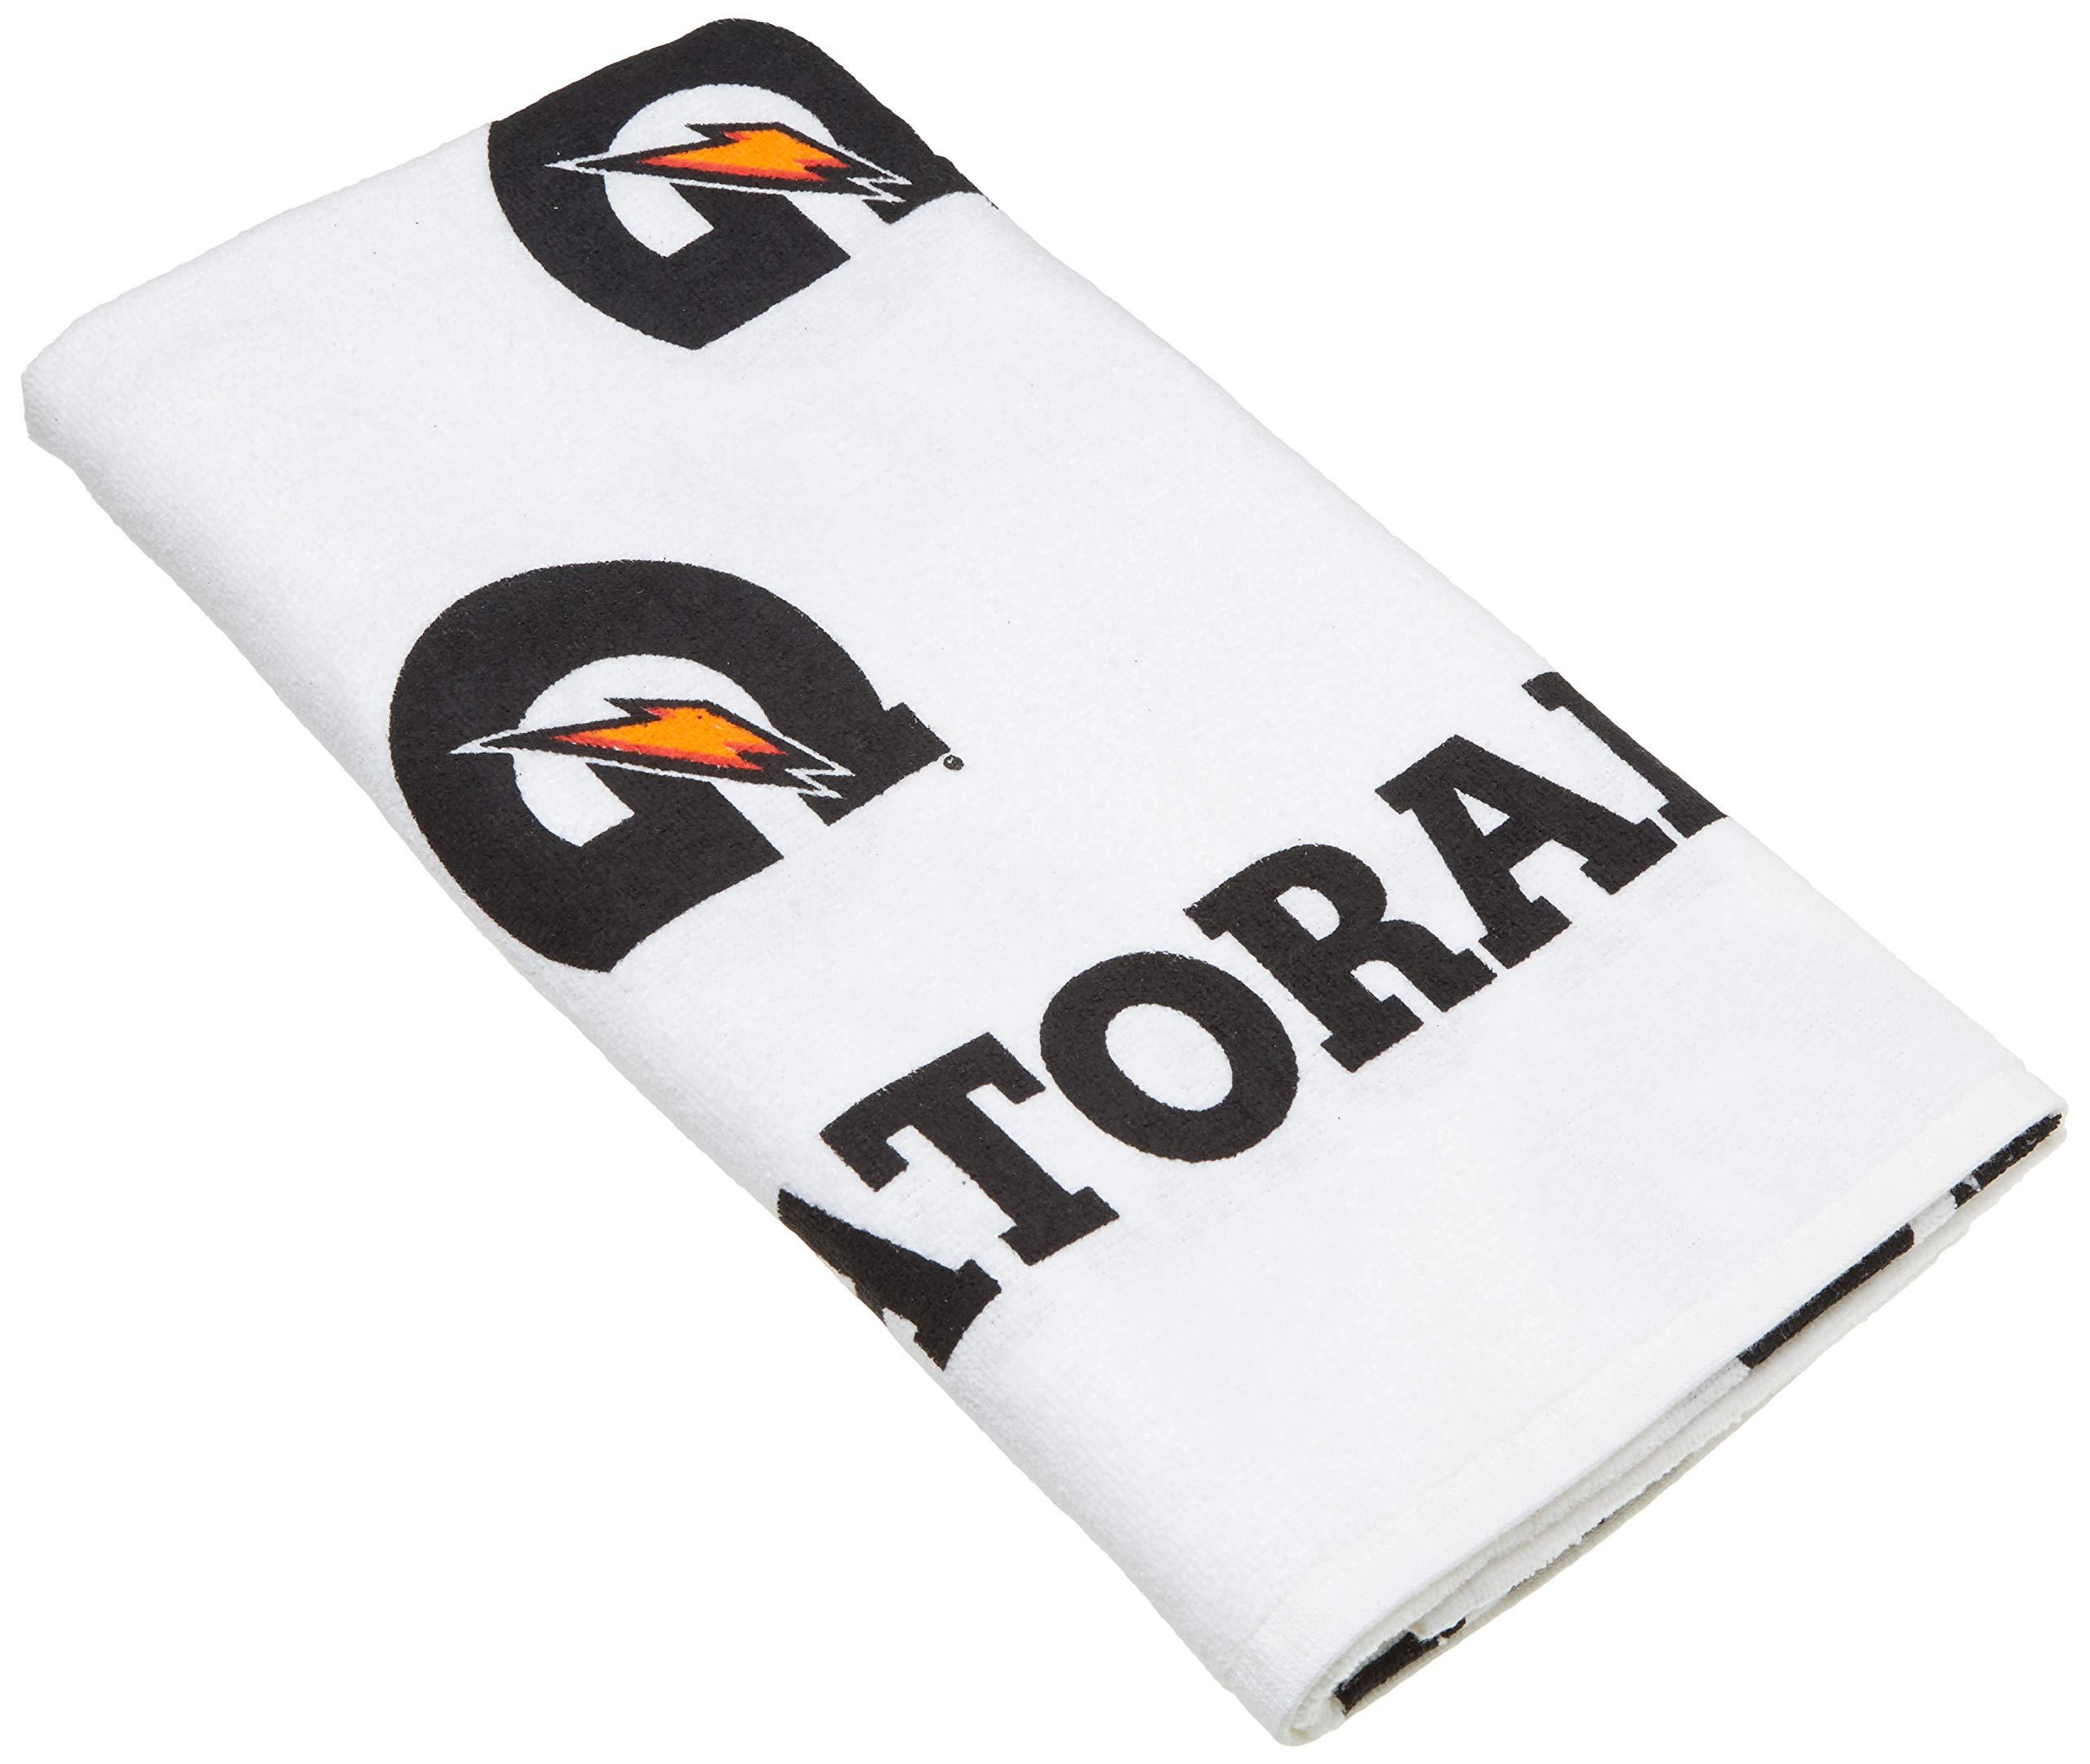 Gatorade Towel White Black Orange